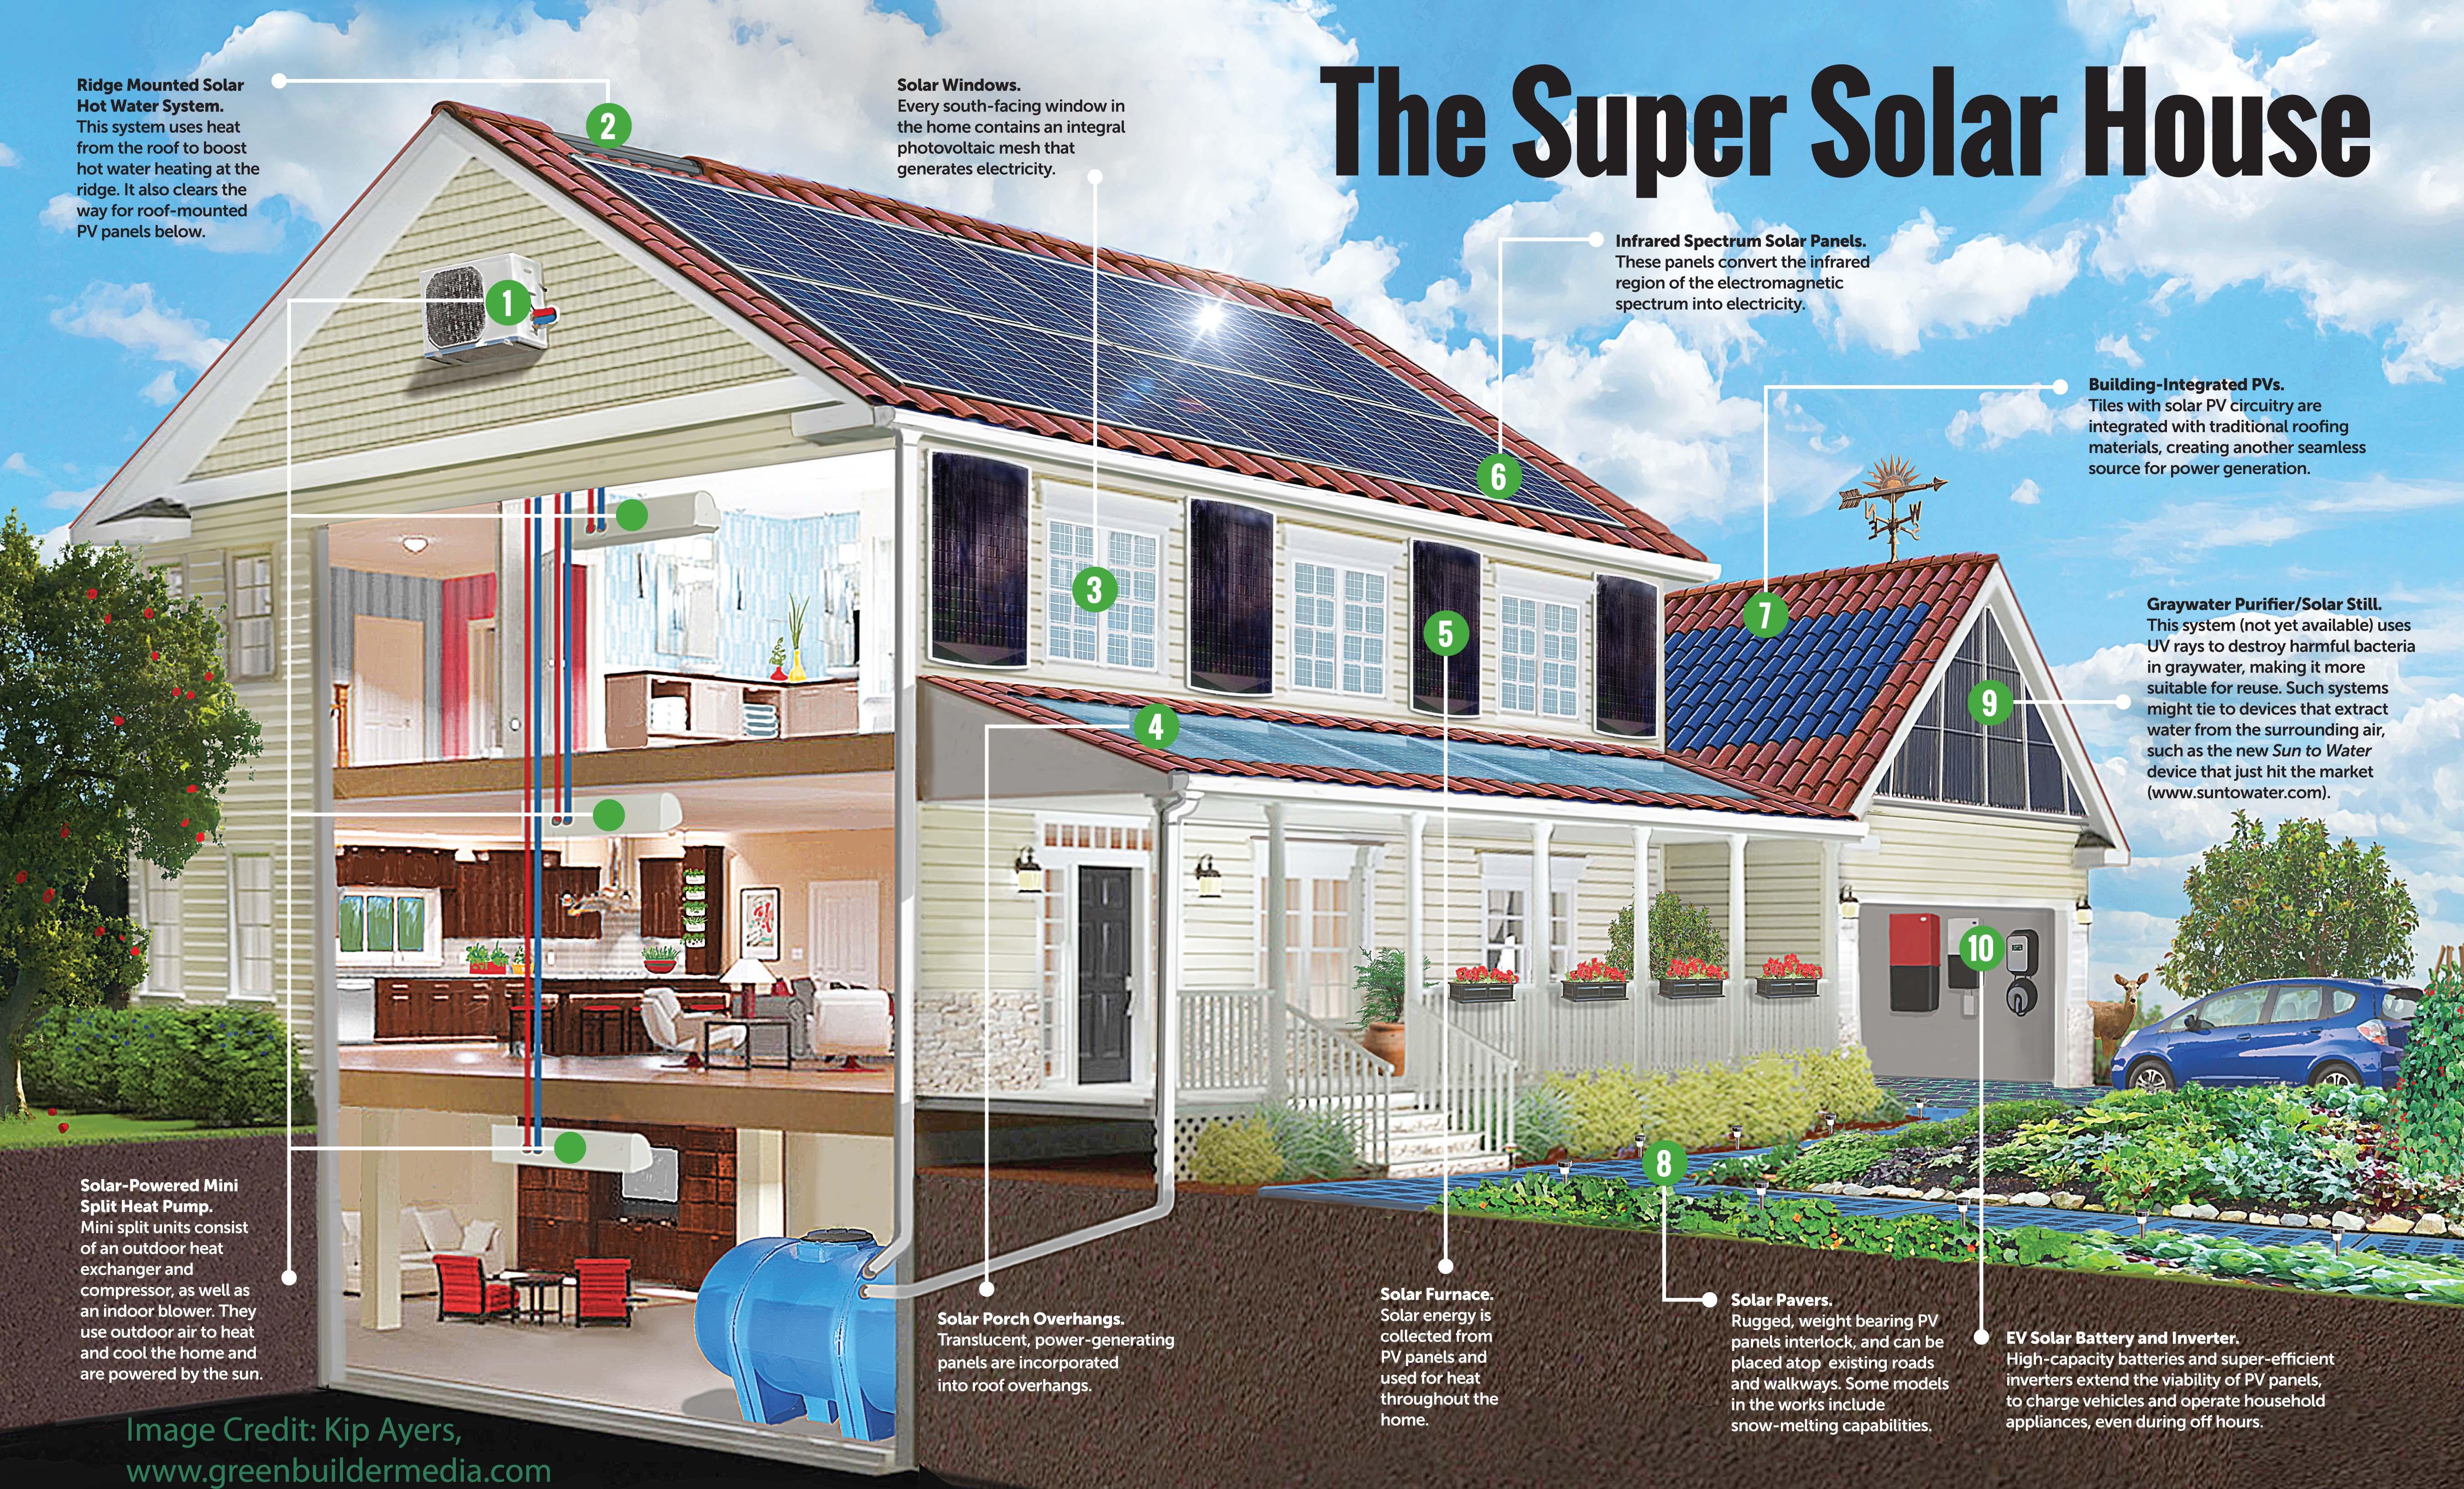 The Super Solar House